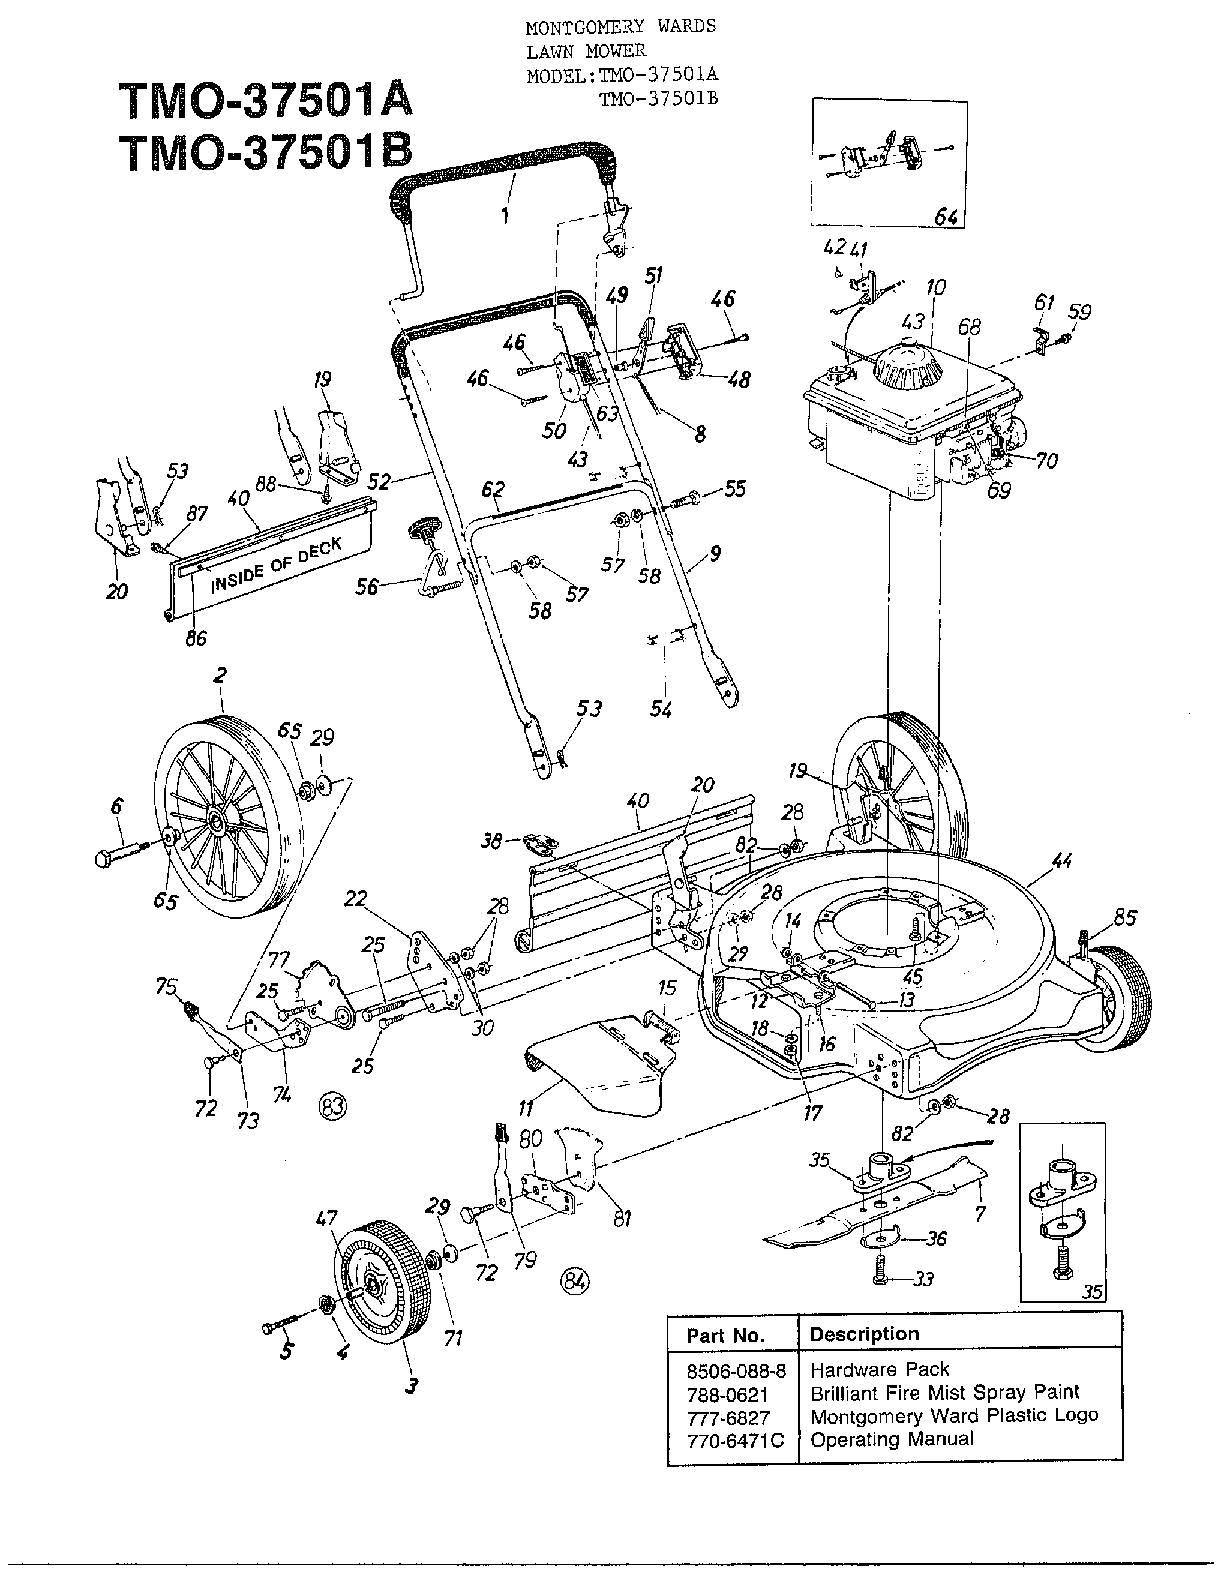 huskee lawn mower parts diagram simplicity sunstar wiring mtd model 37501a sears partsdirect